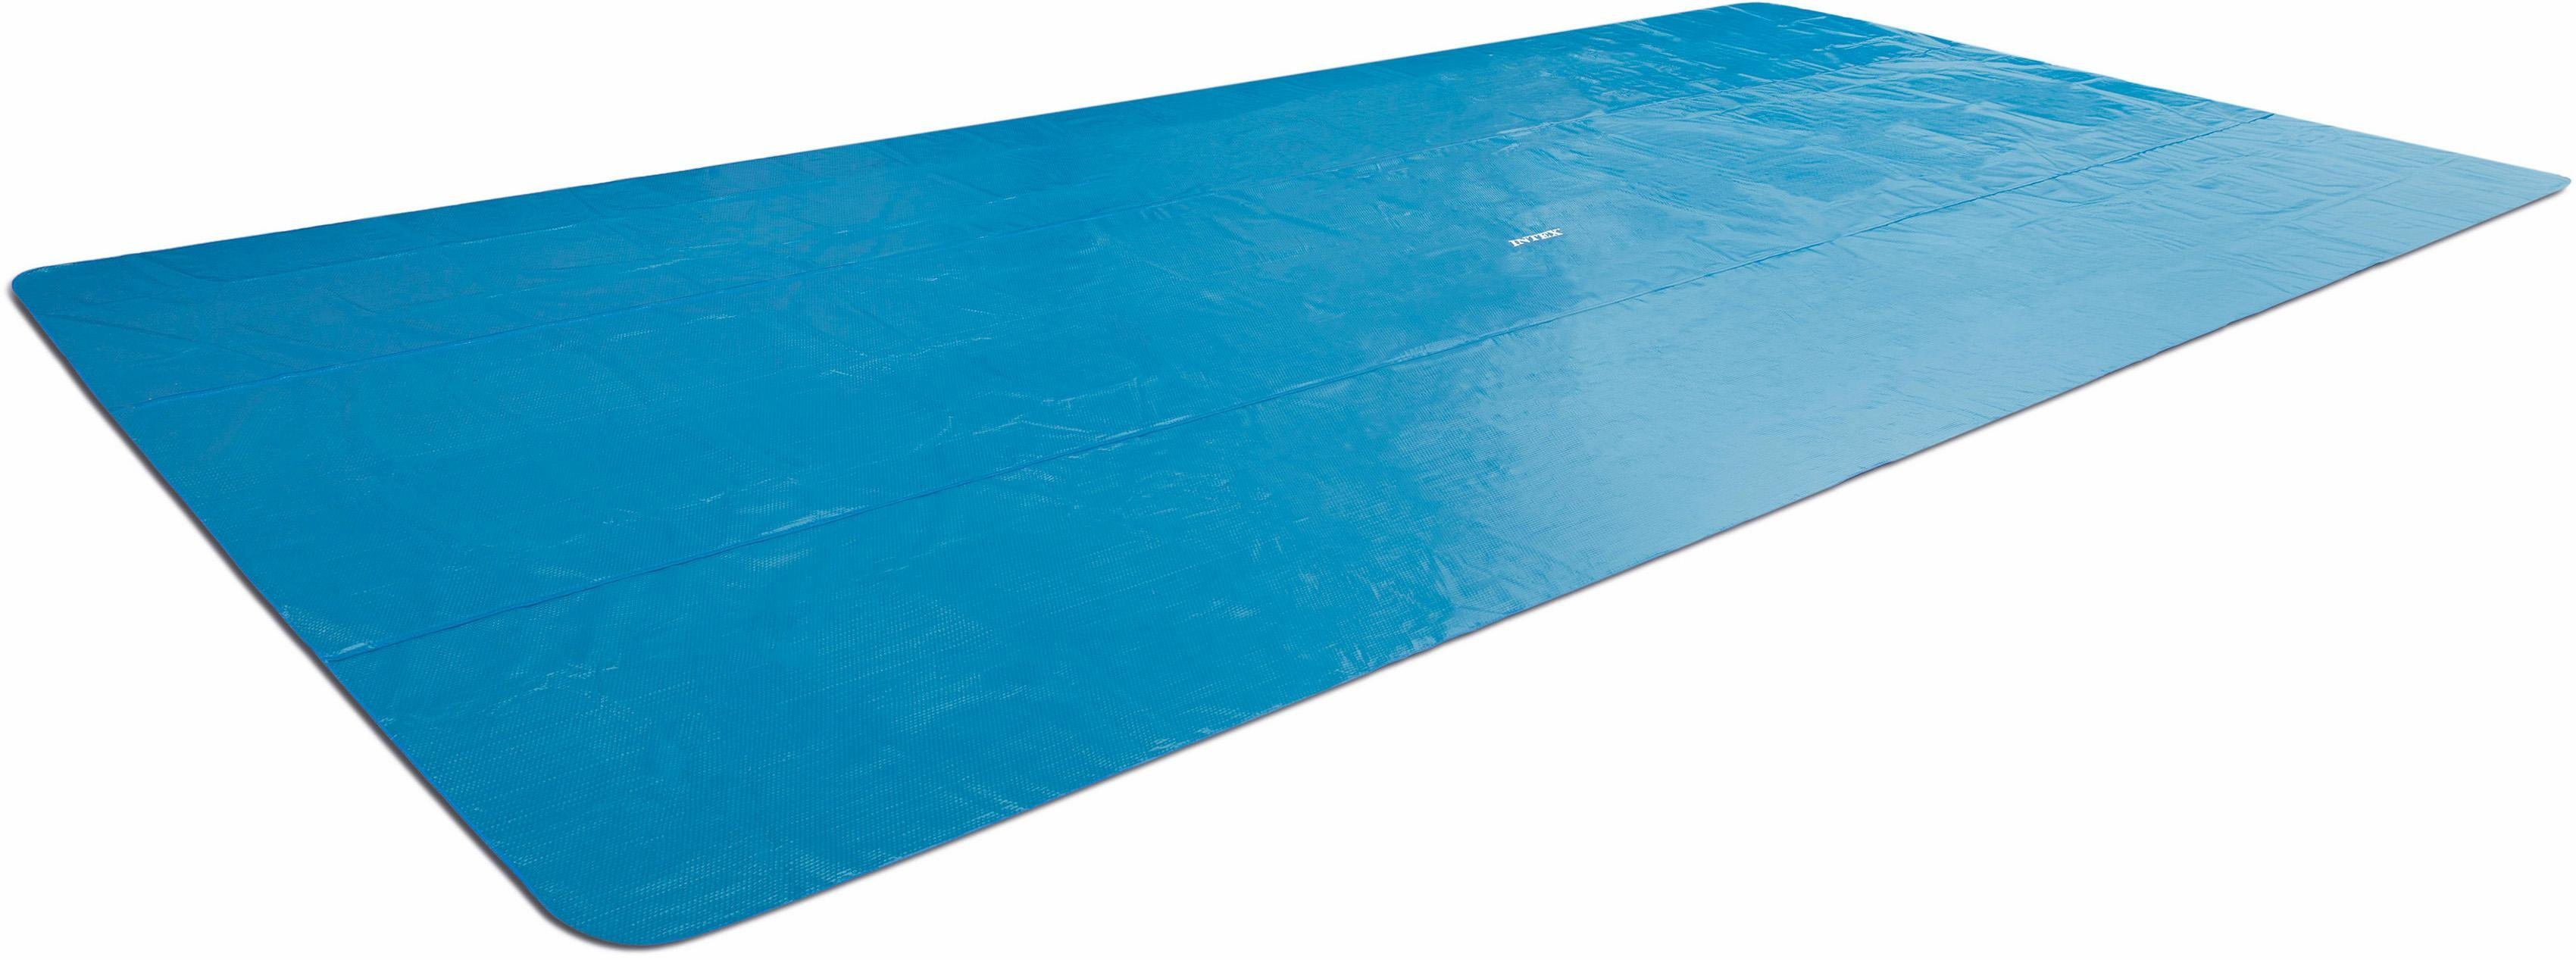 Solarabdeckplane »Solar Pool Cover«